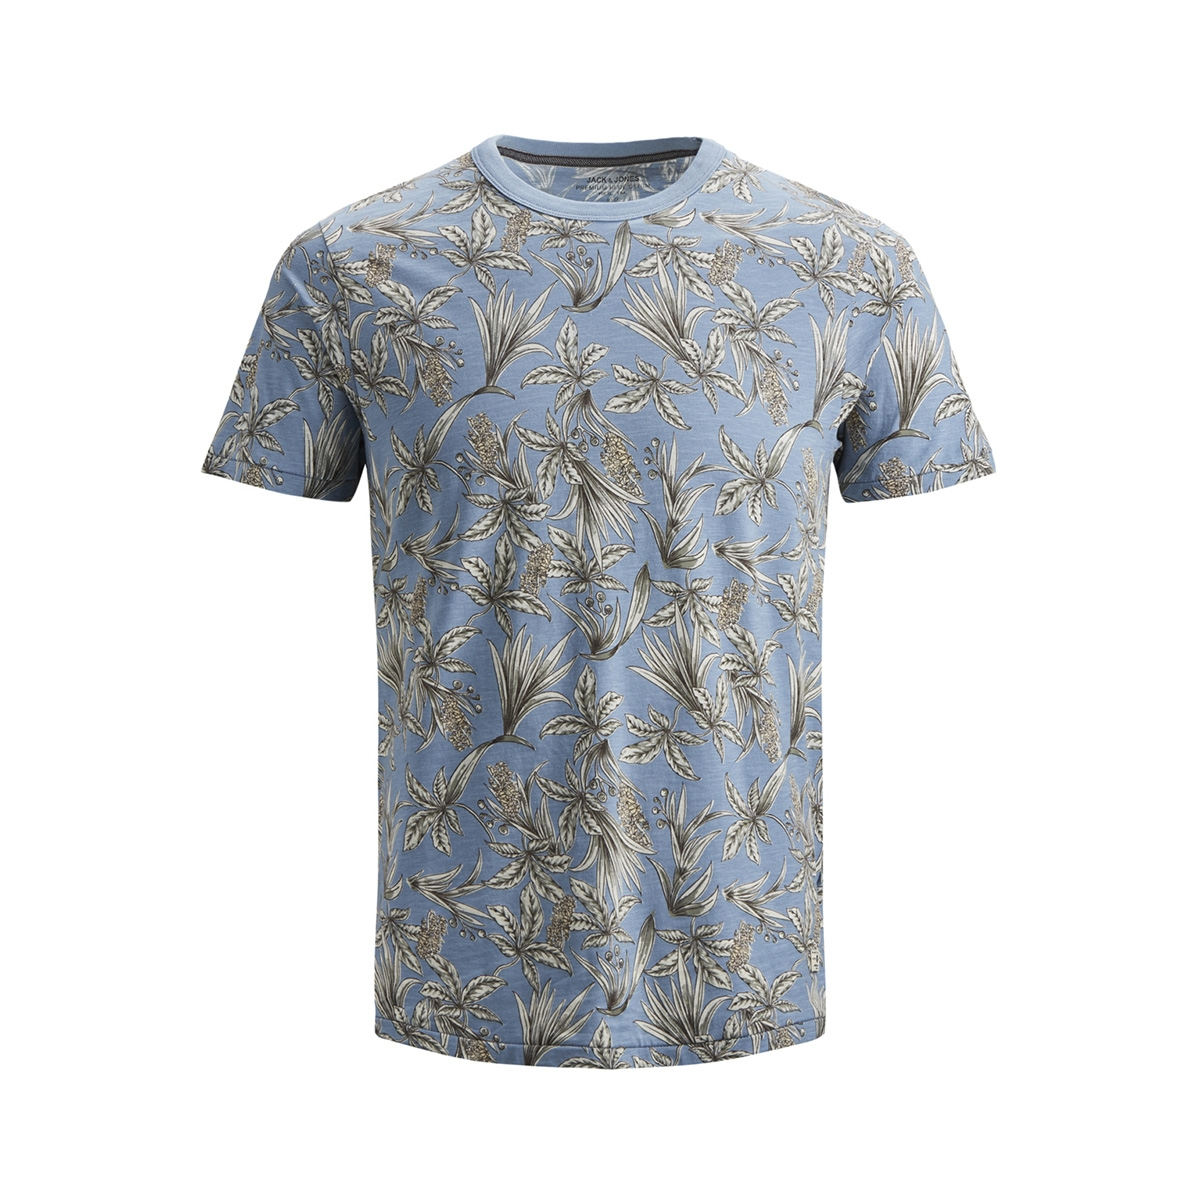 jprcaleb blu. tee ss crew neck 12152276 jack & jones t-shirt faded denim